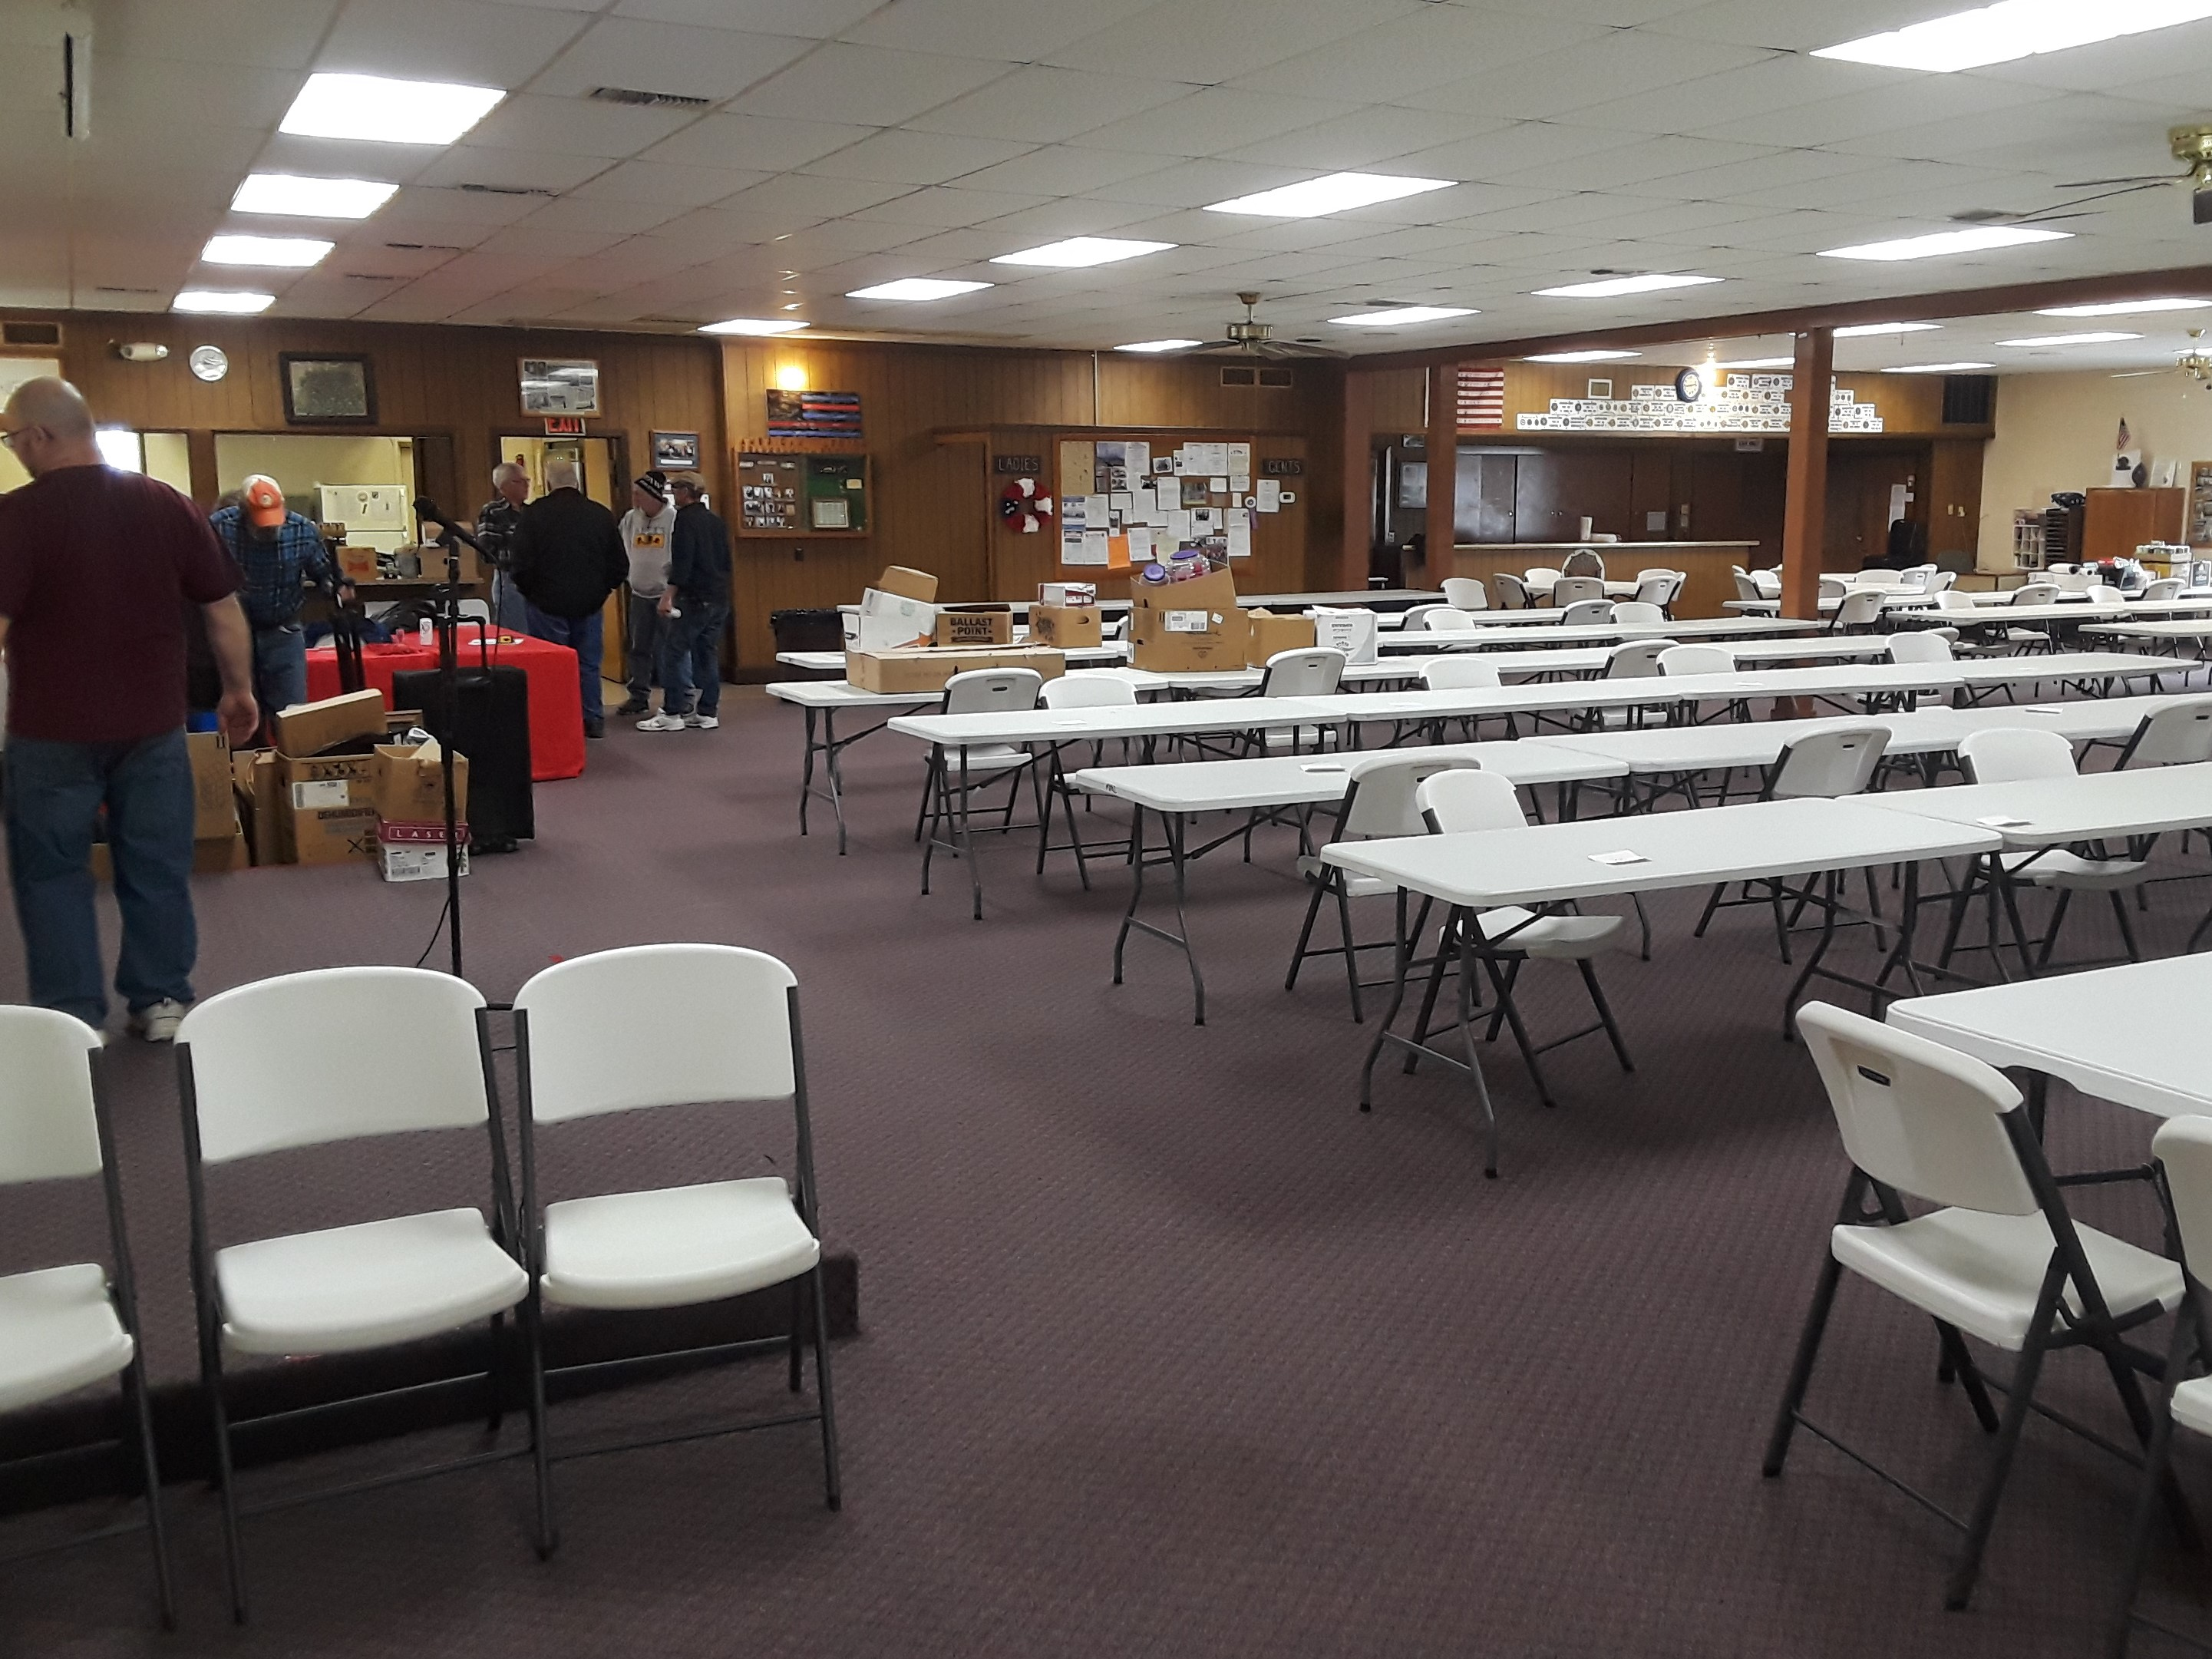 set-up-2-19